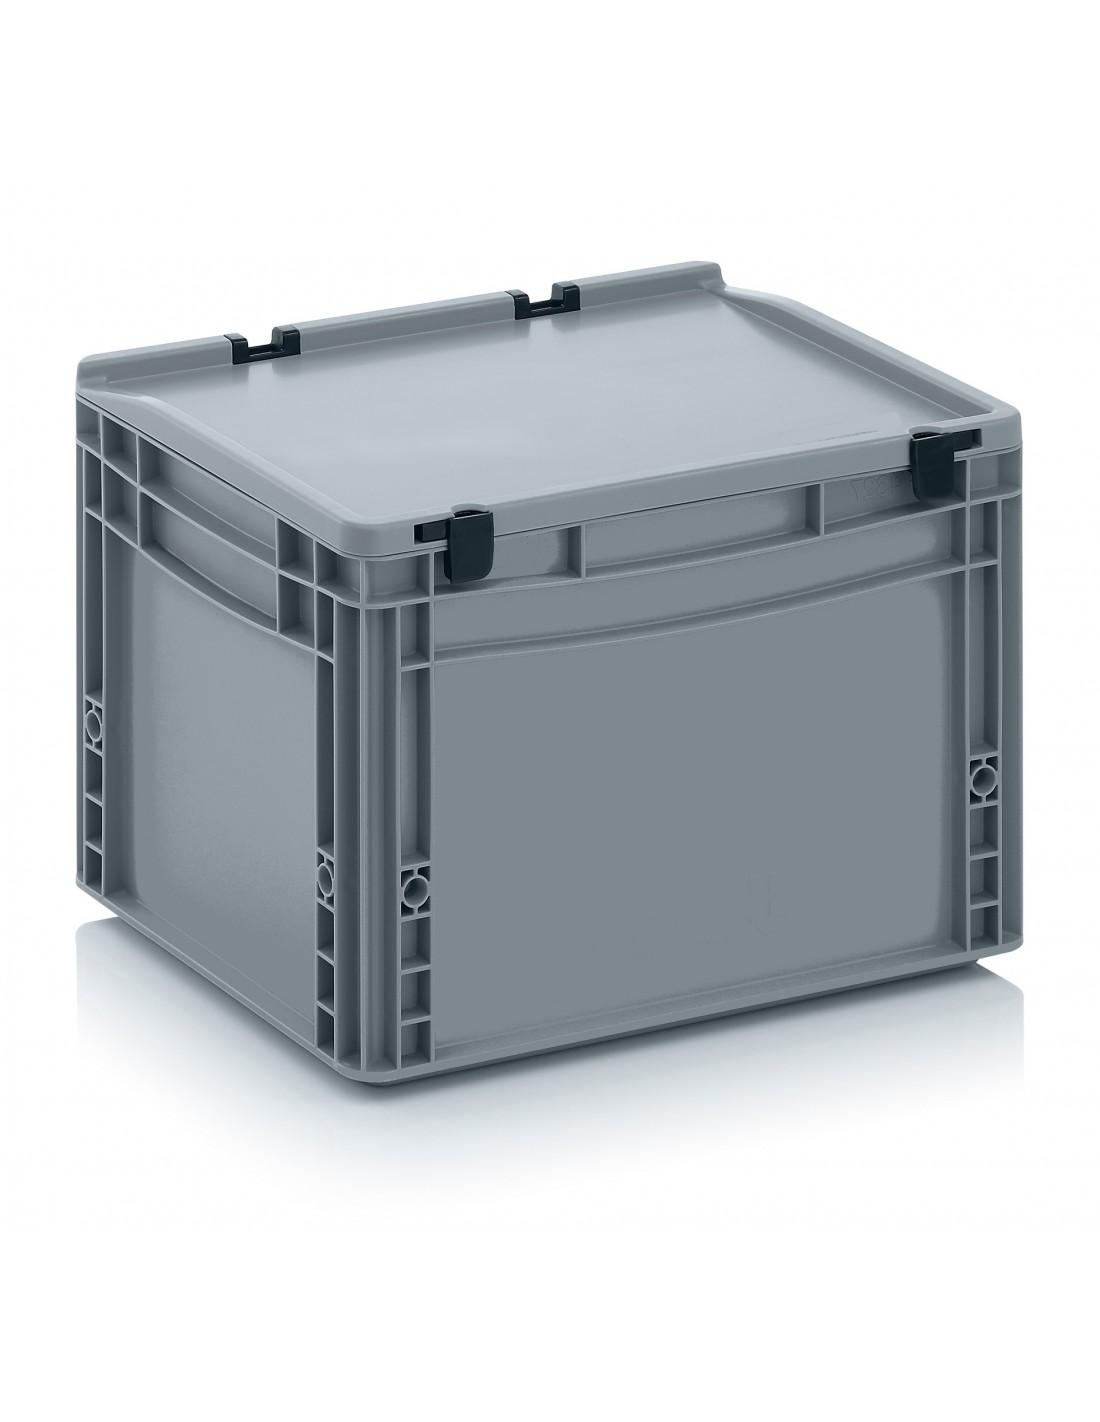 400 x 300 x 270 mm Eurobehälter Scharnierdeckel